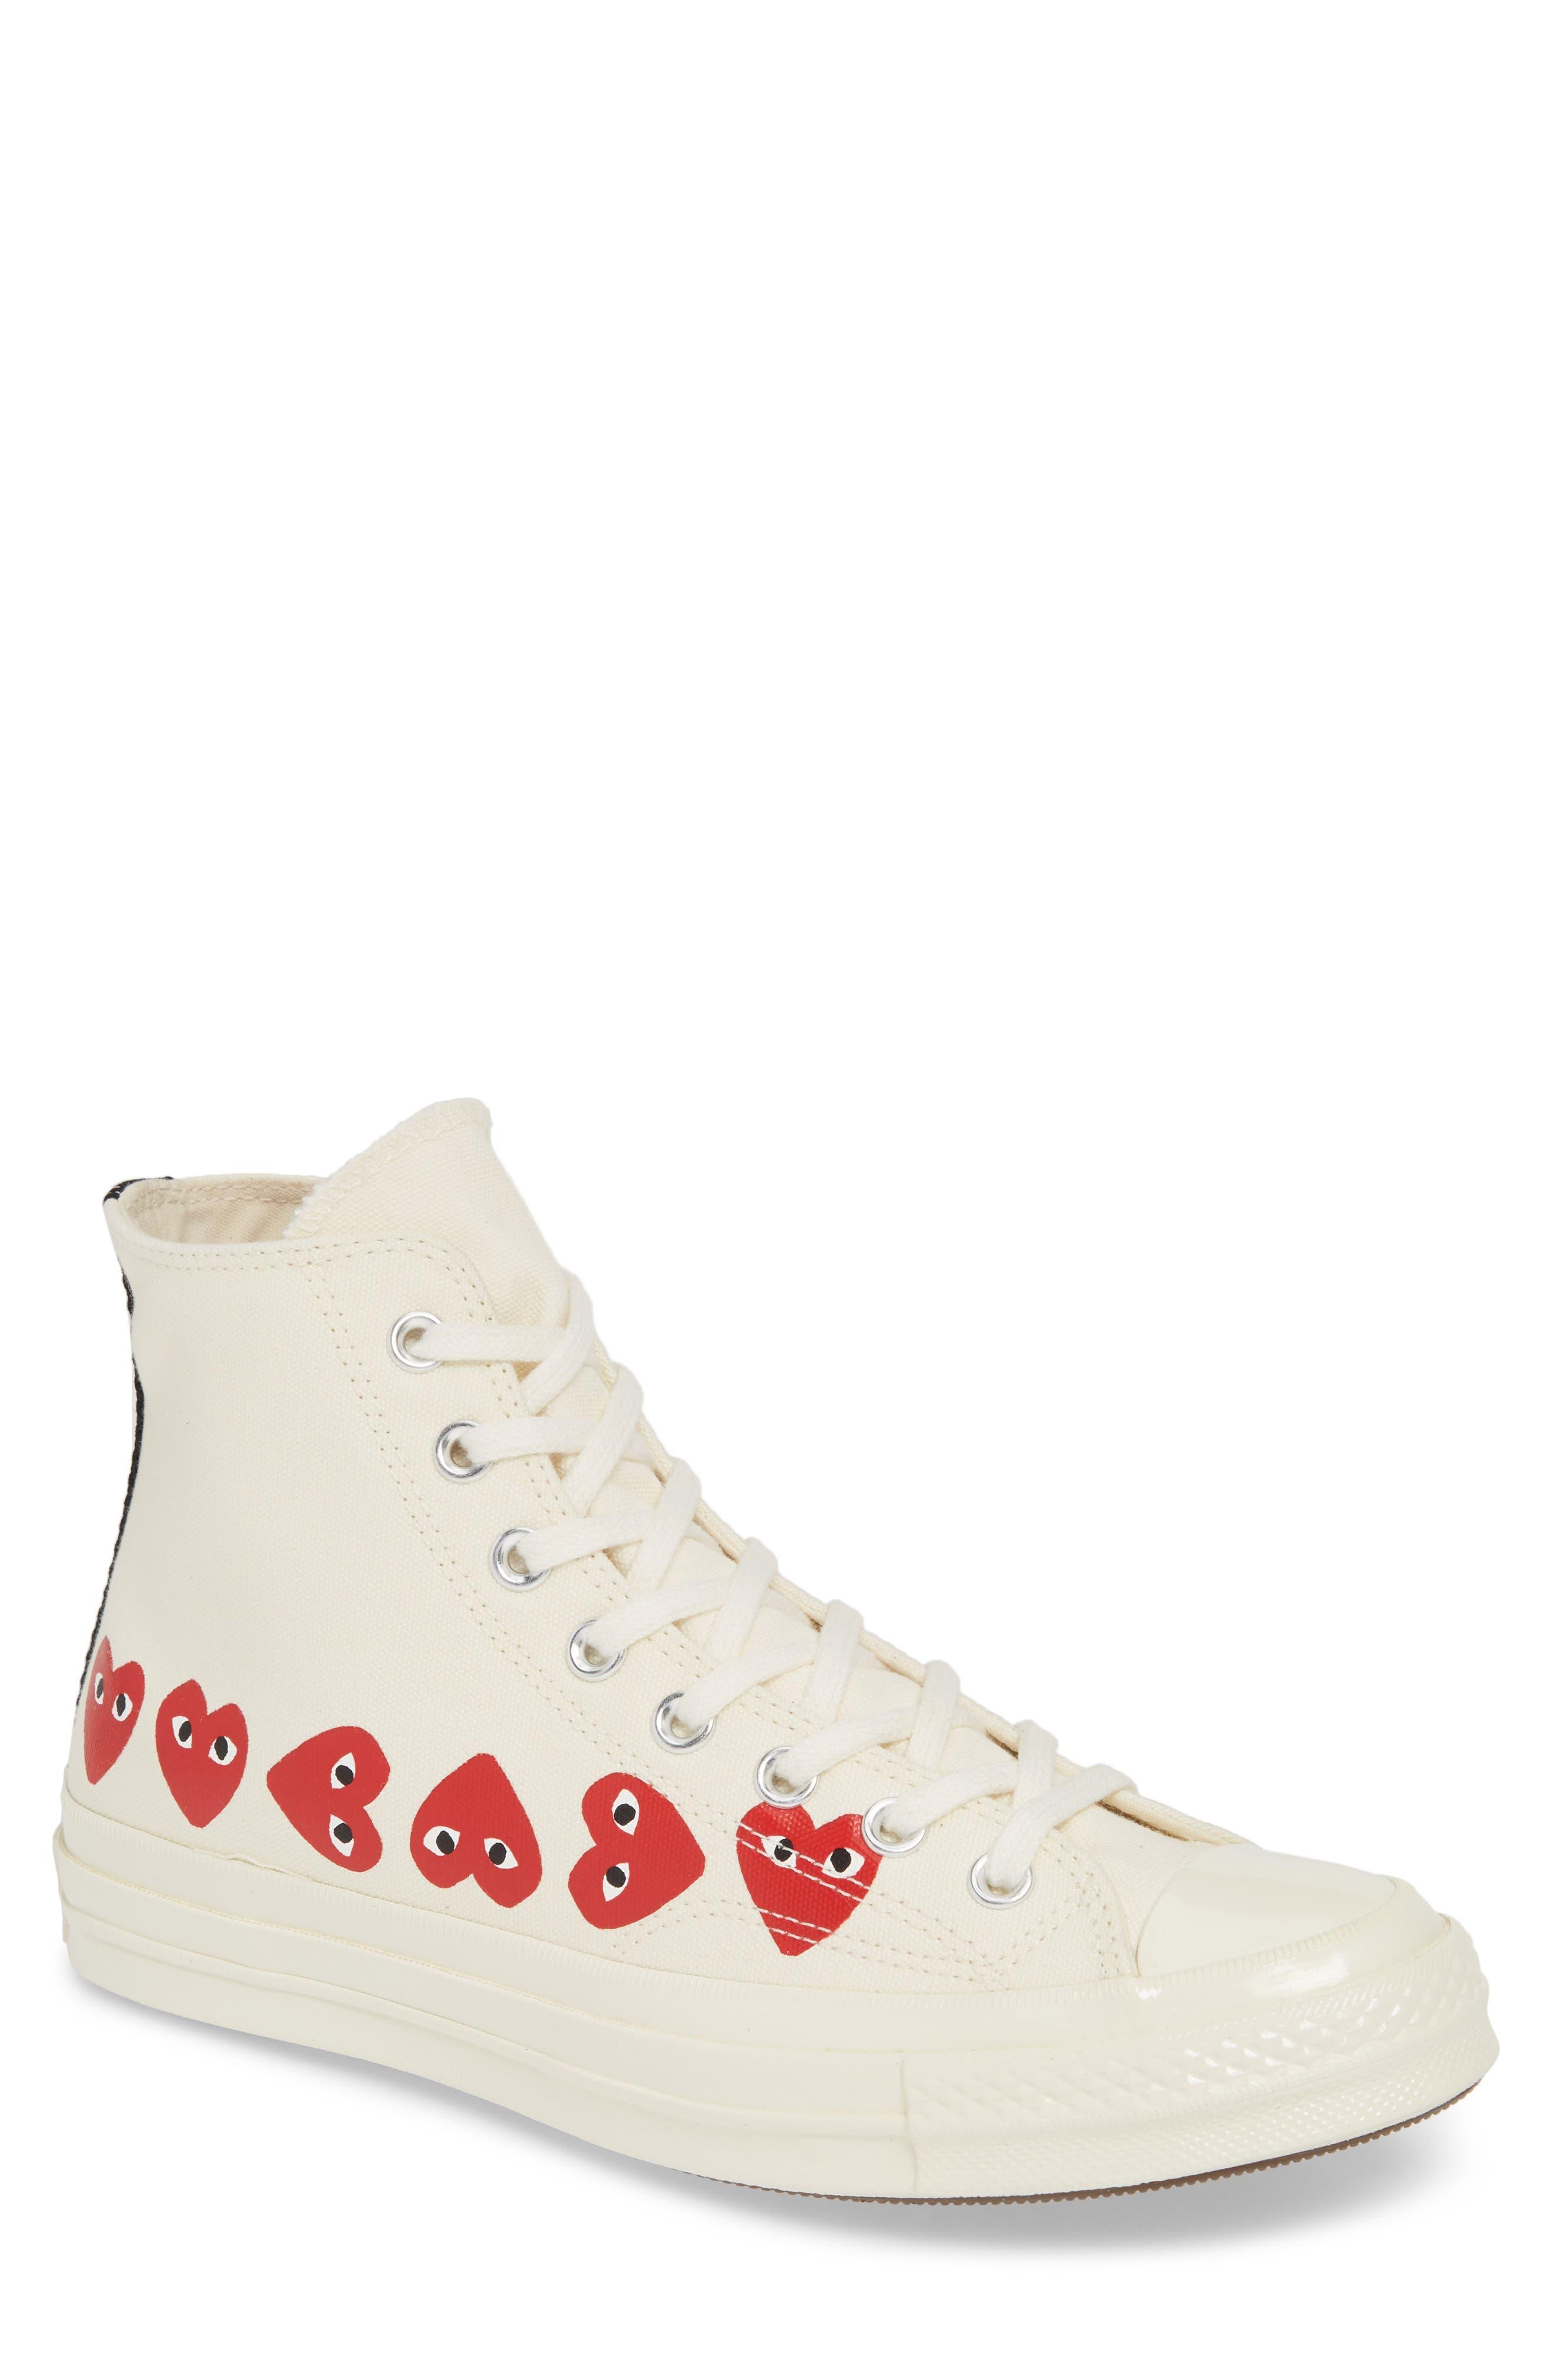 COMME DES GARÇONS PLAY, Multiheart Sneaker, Main thumbnail 1, color, OFF WHITE